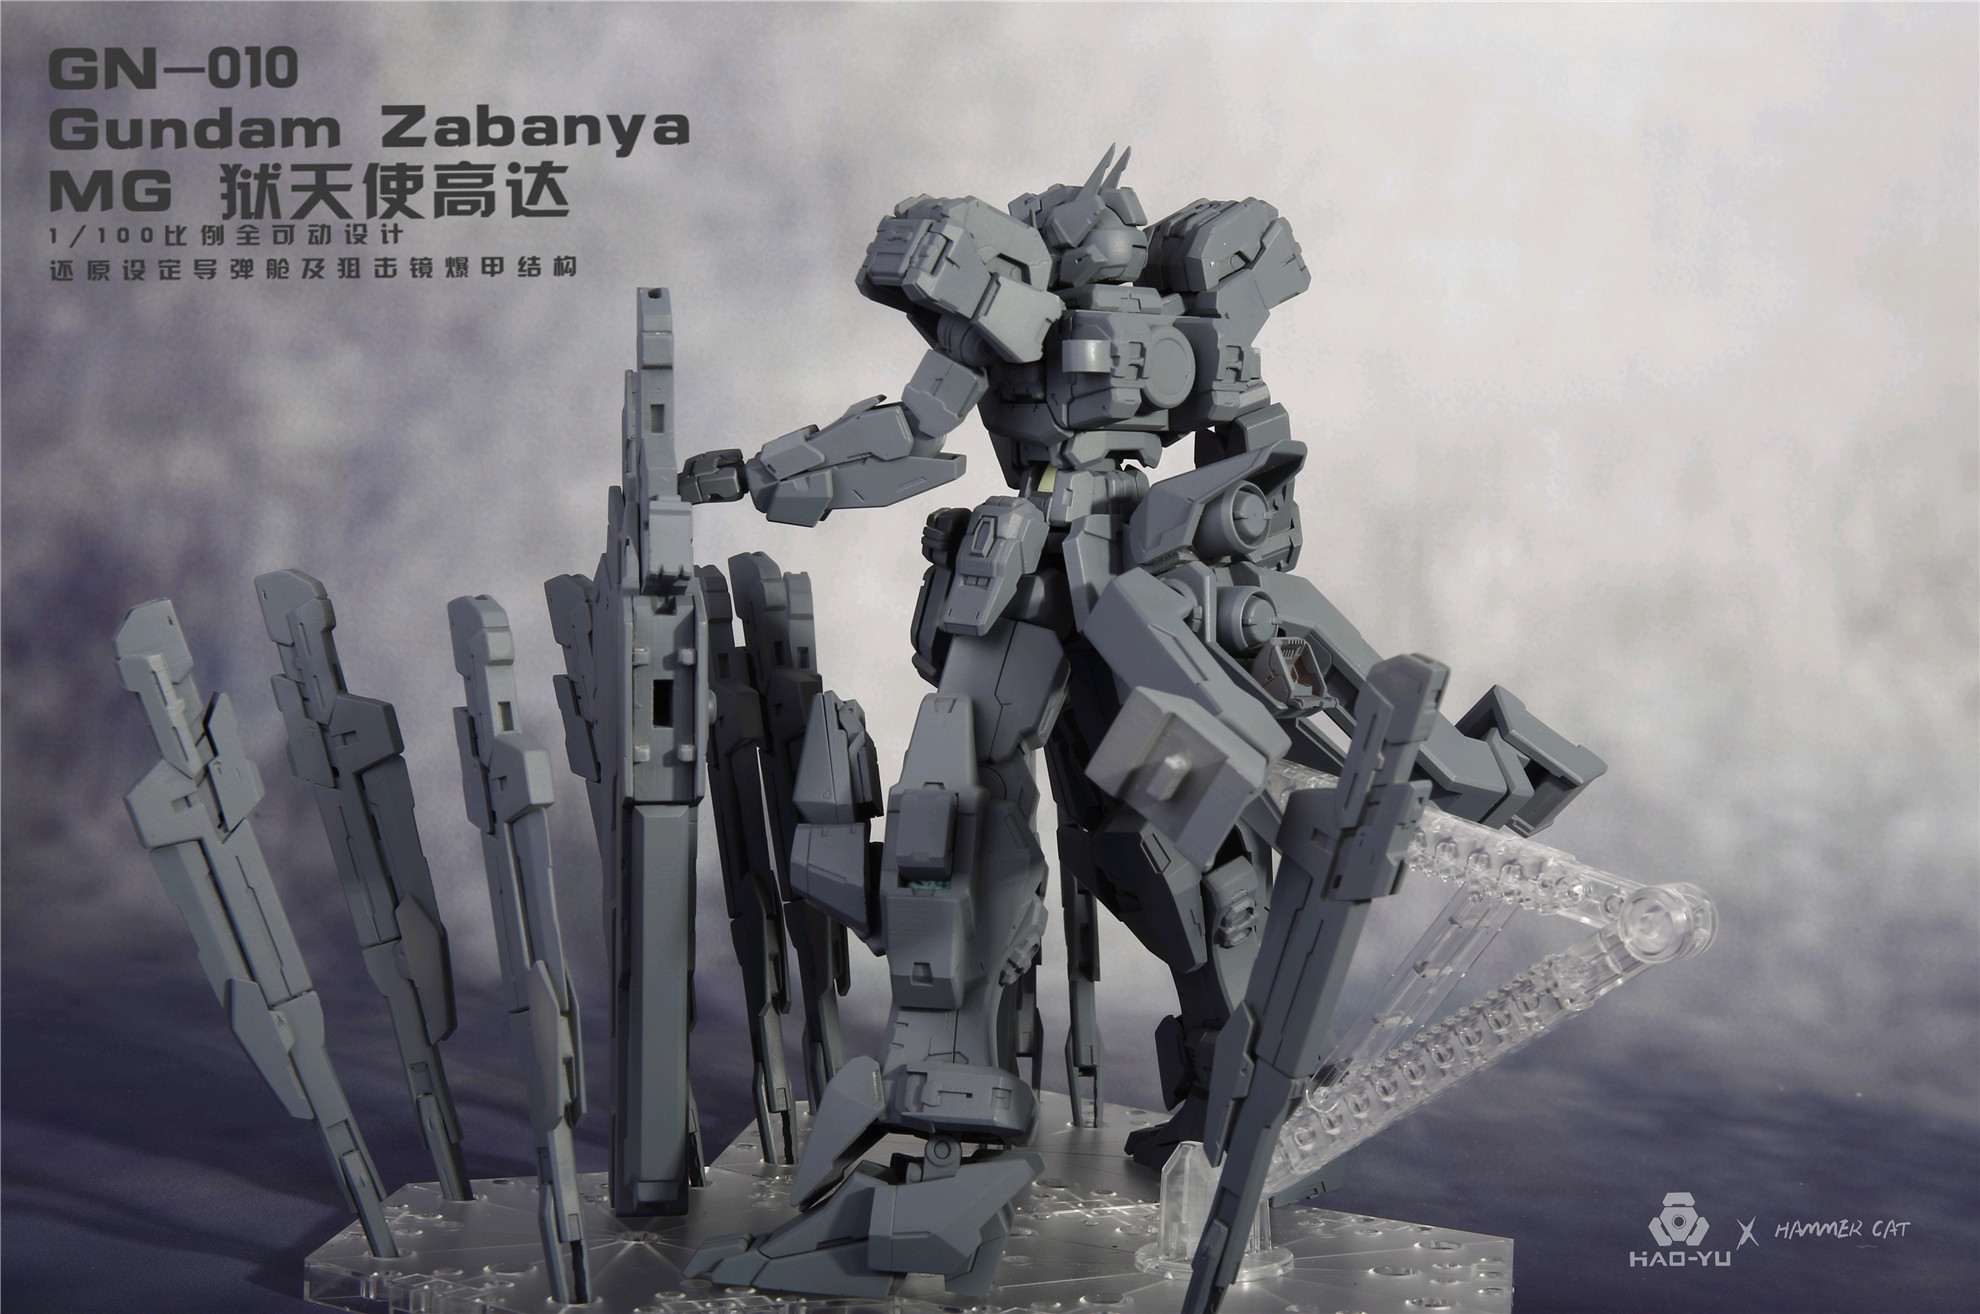 G652_Gundam_Zabanya_010.jpg